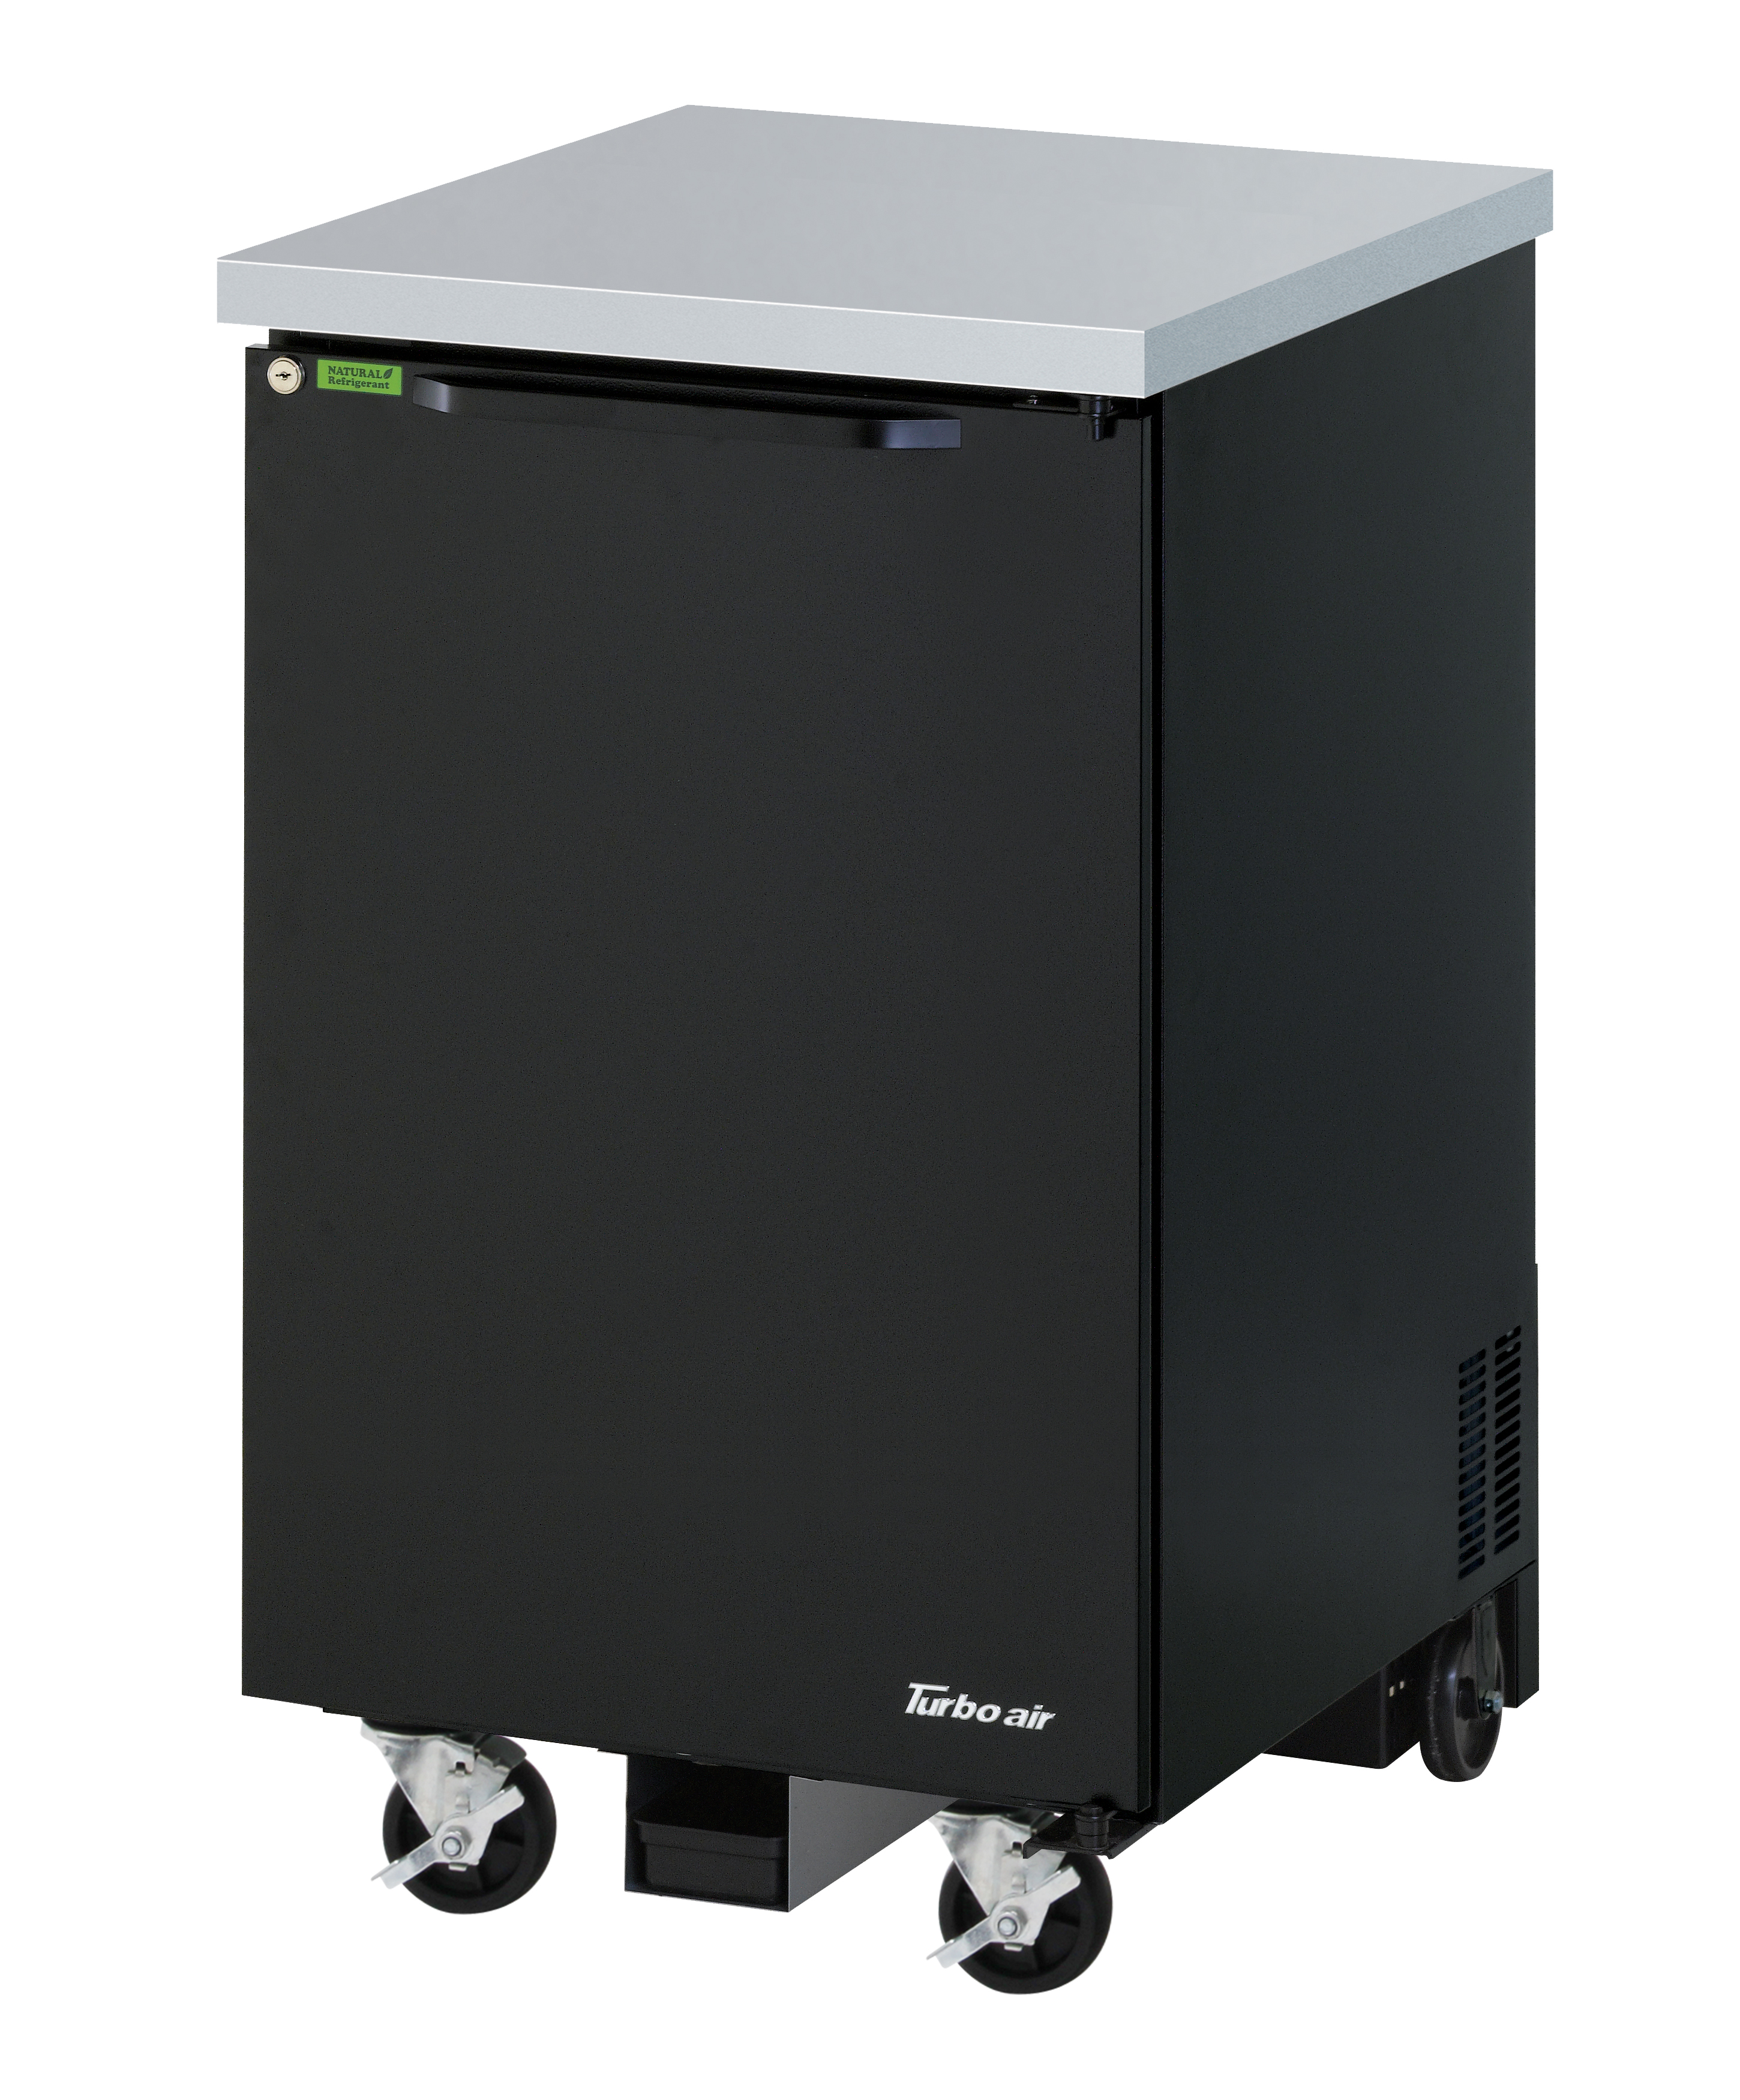 Turbo Air TBB-1SBD-N6 back bar cabinet, refrigerated